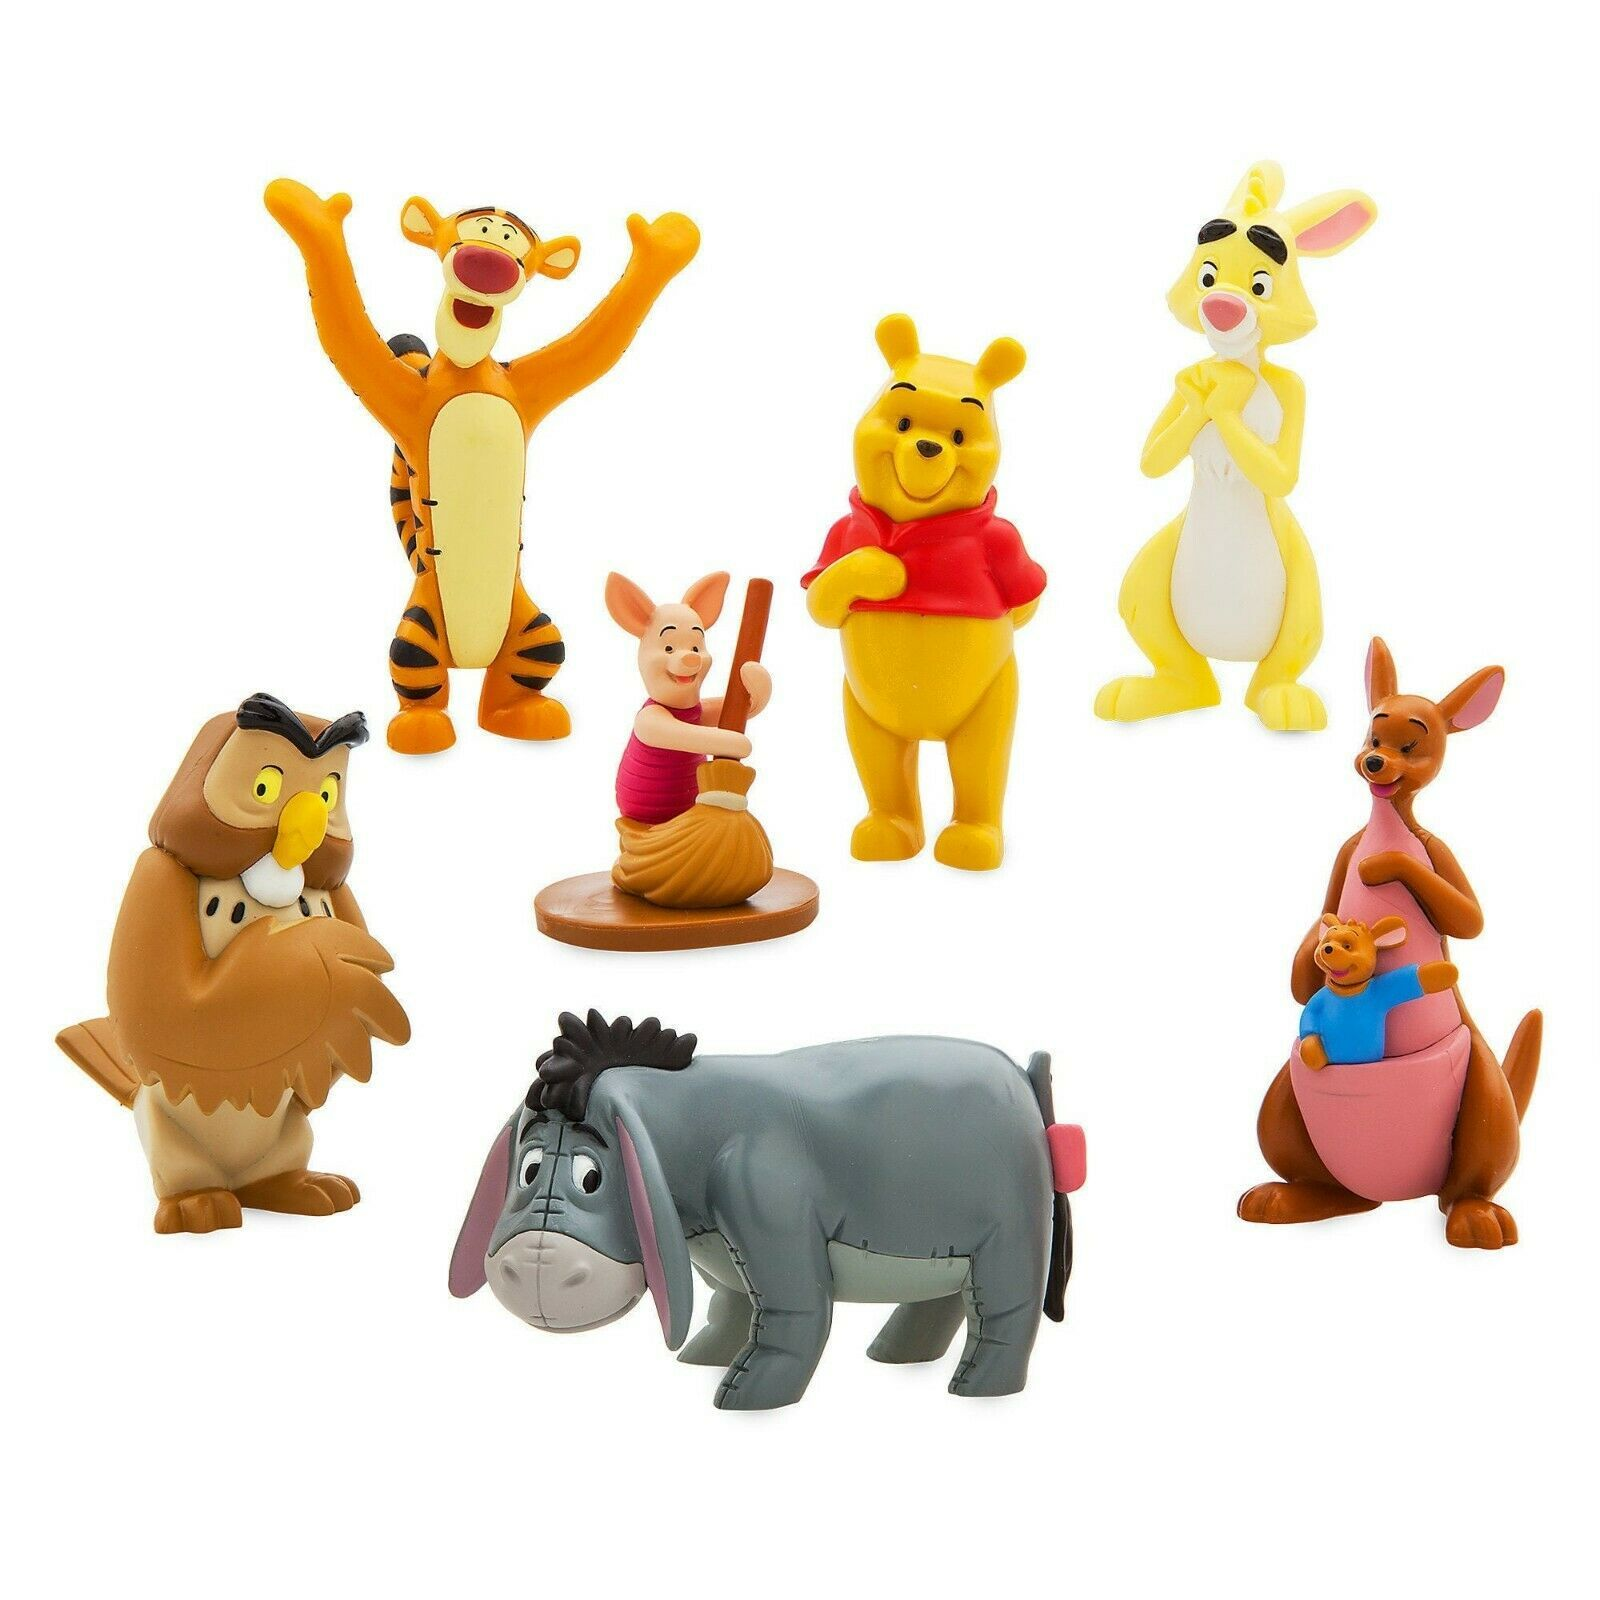 "Disney Store Winnie the Pooh 7pc Figure PVC Doll 3.5"" Figurine Playset Toy New"